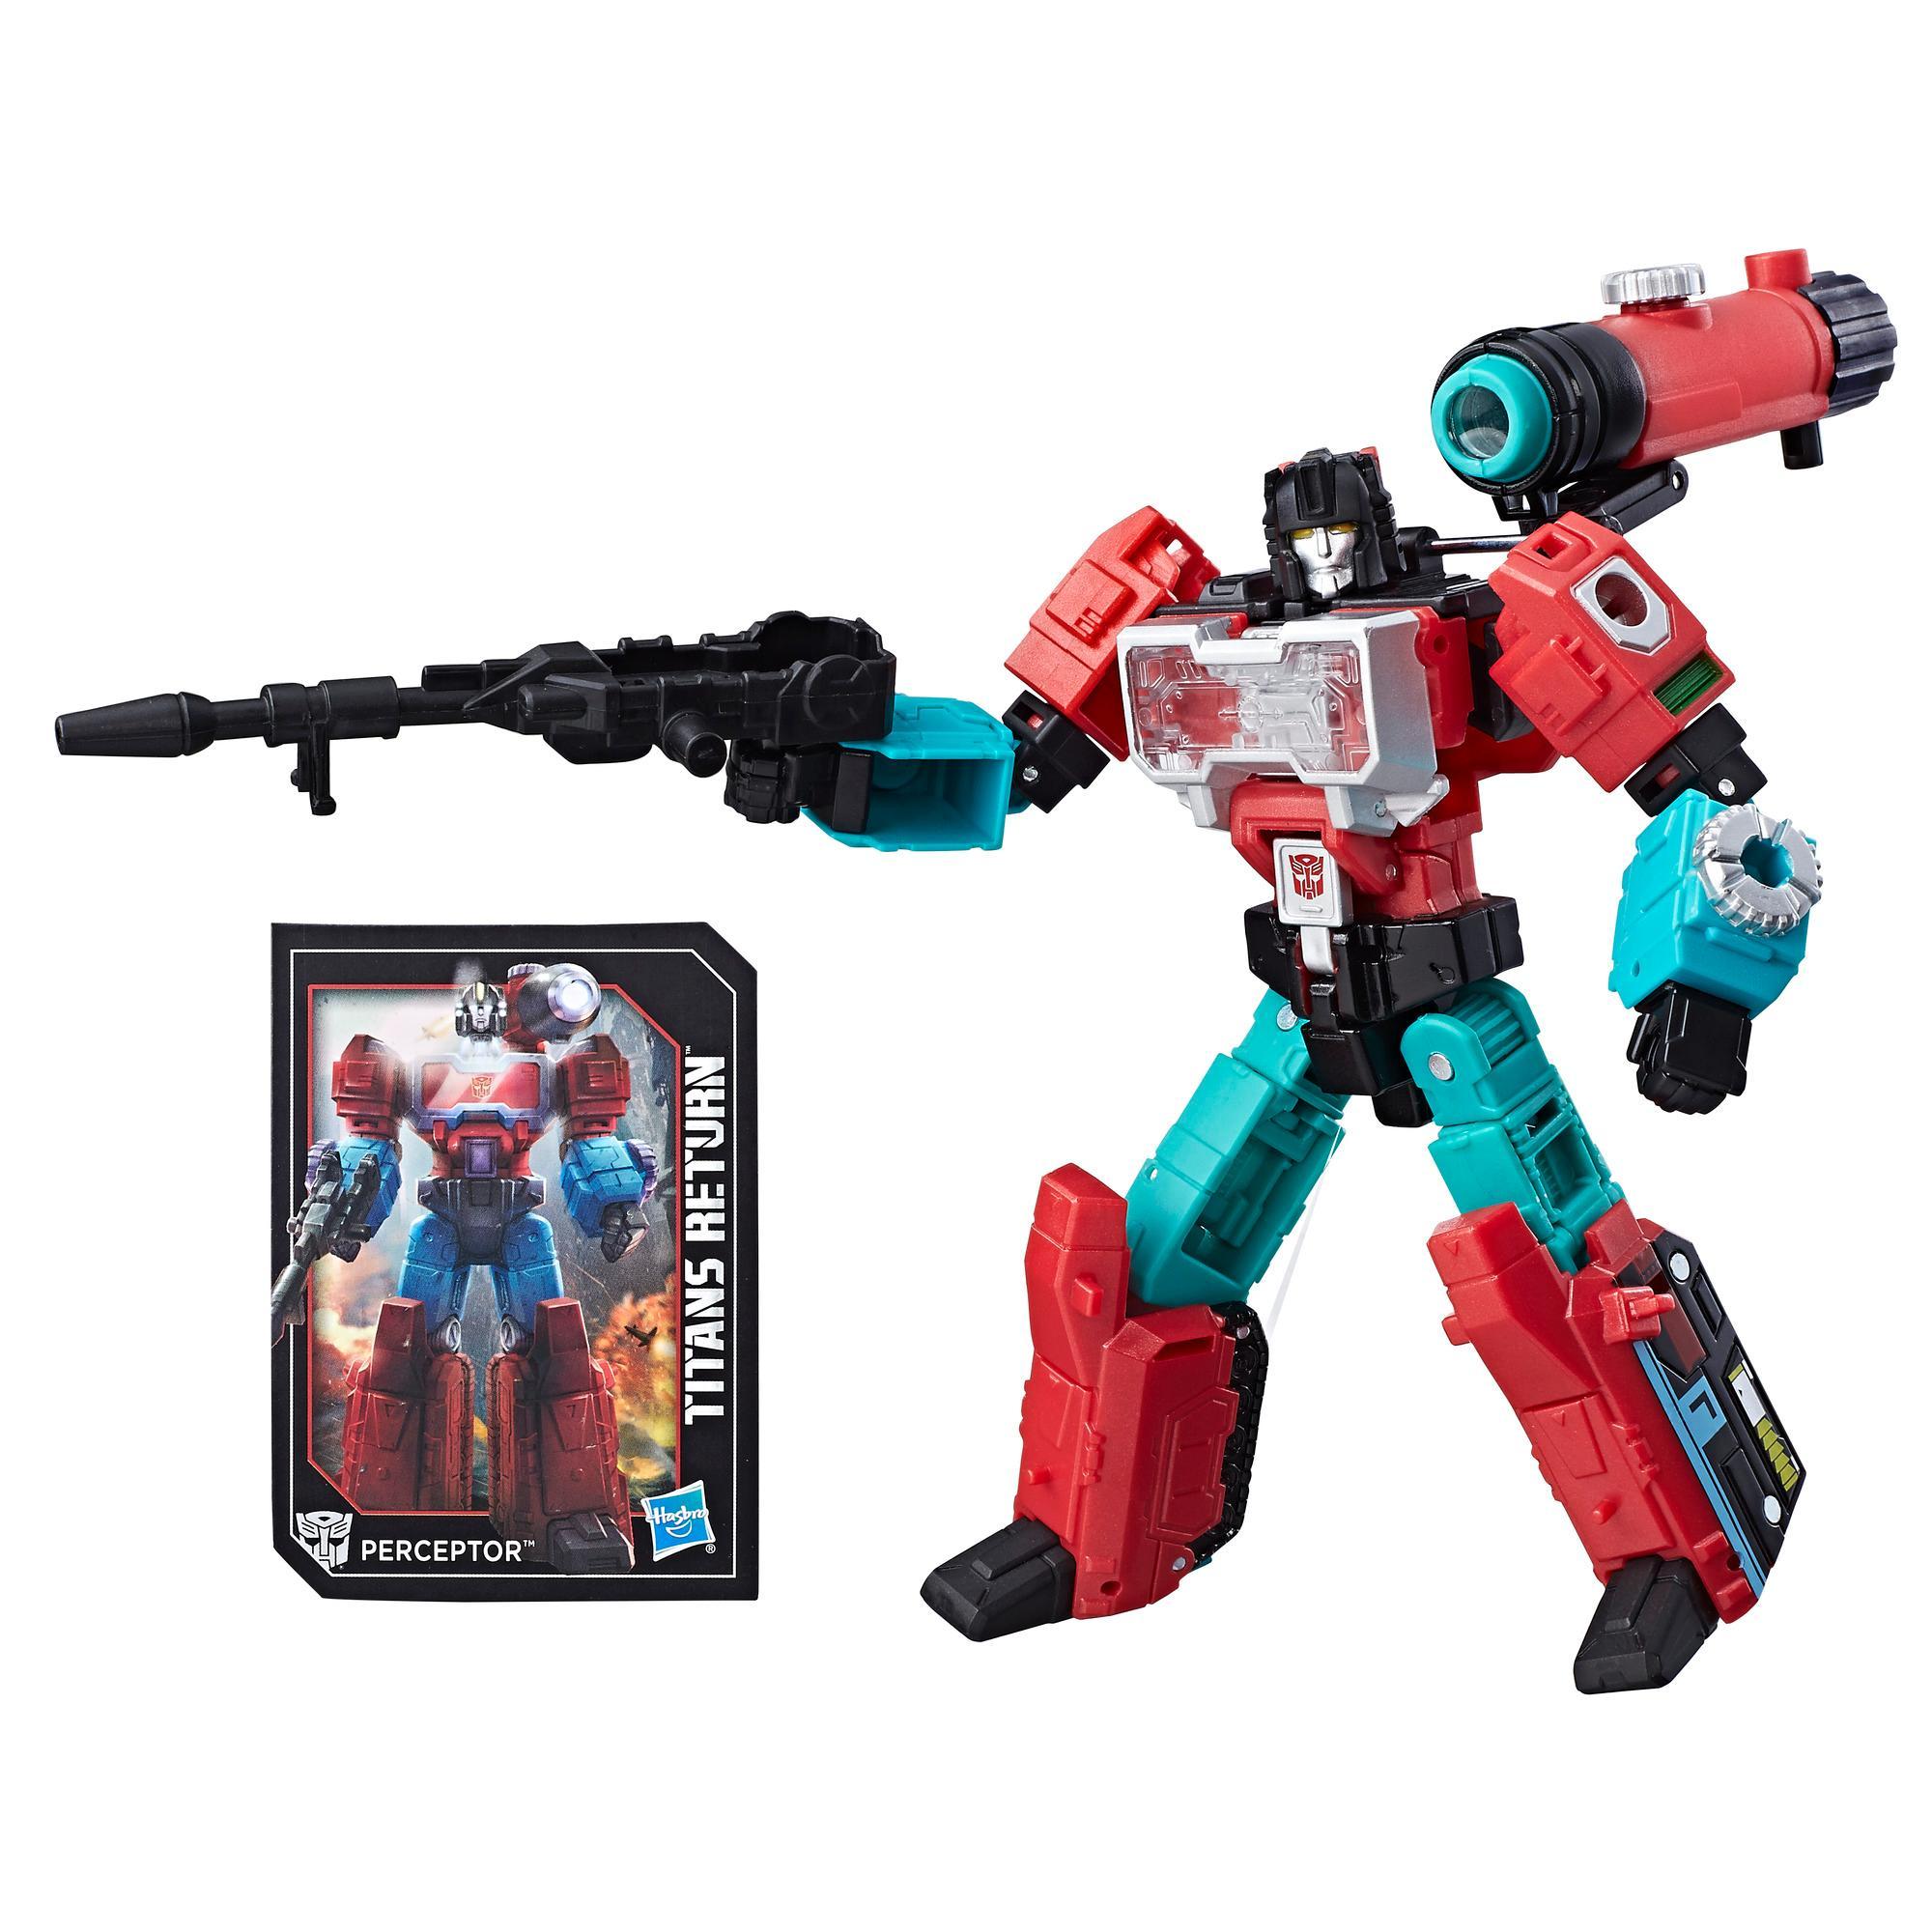 Transformers Generations Visszatérő Titánok Autobot Perceptor & Convex